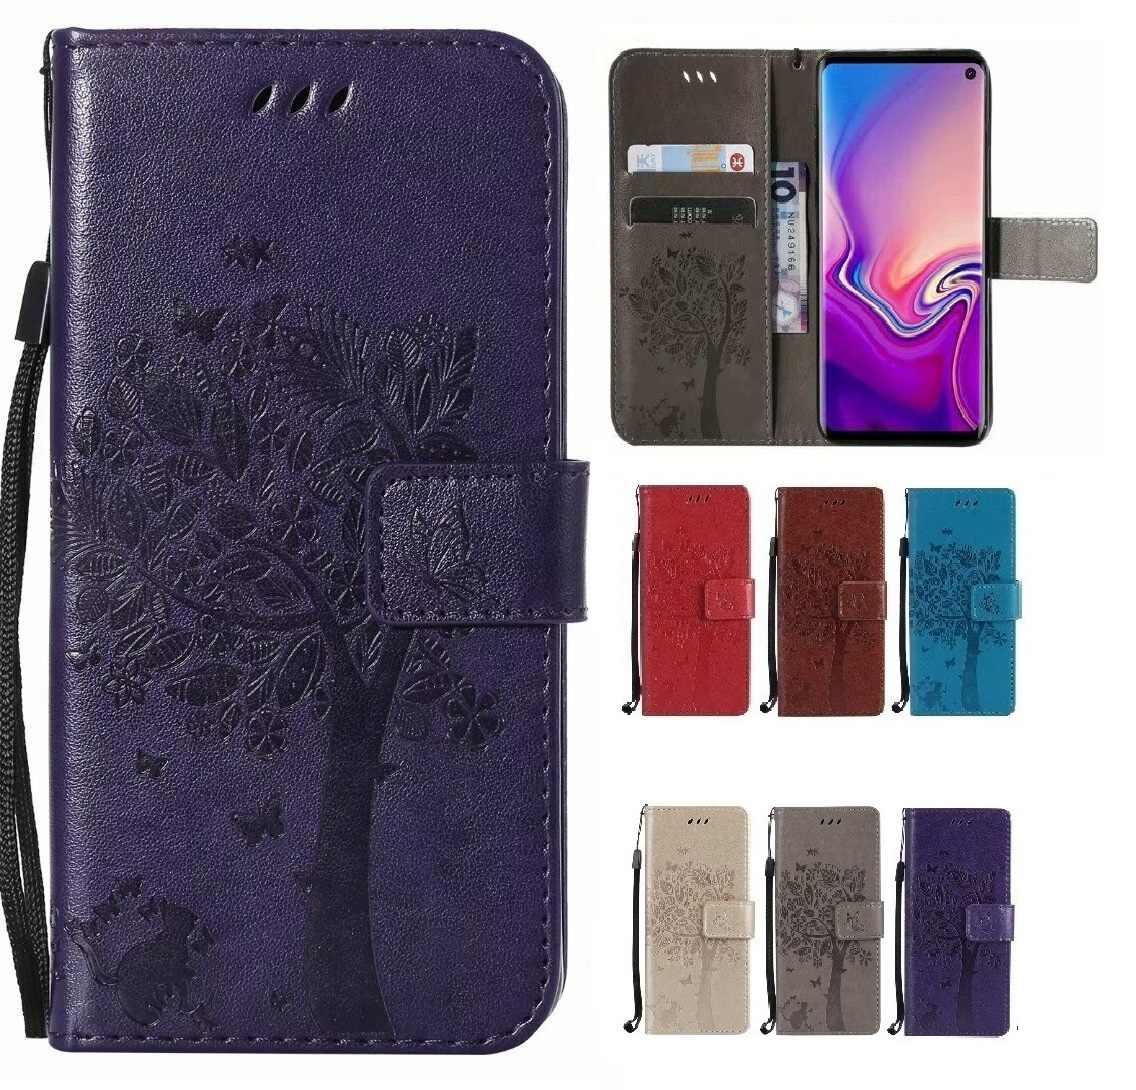 Funda tipo billetera con tapa para Micromax Canvas Spark 3 Q385 Q354 Q402 D303 bolsa protectora de cuero de alta calidad para teléfono móvil libro